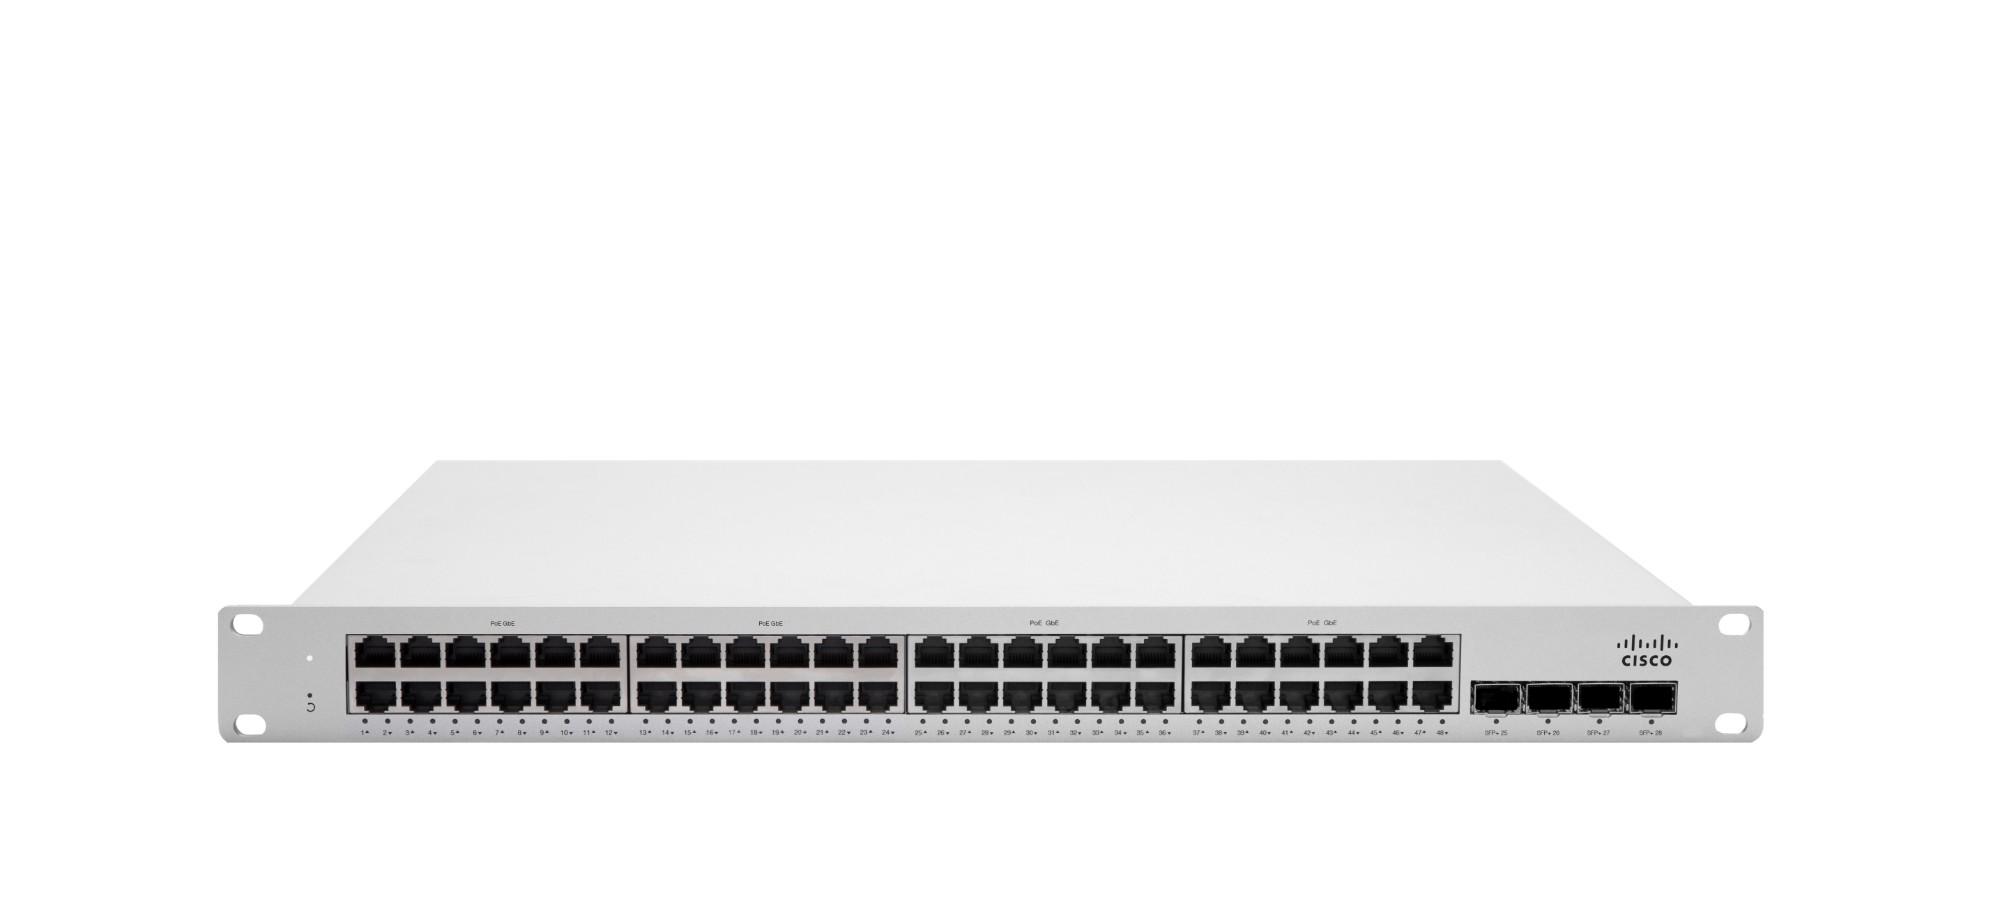 Cisco Meraki MS250-48FP Gestionado L3 Gigabit Ethernet (10/100/1000) Gris 1U Energía sobre Ethernet (PoE)